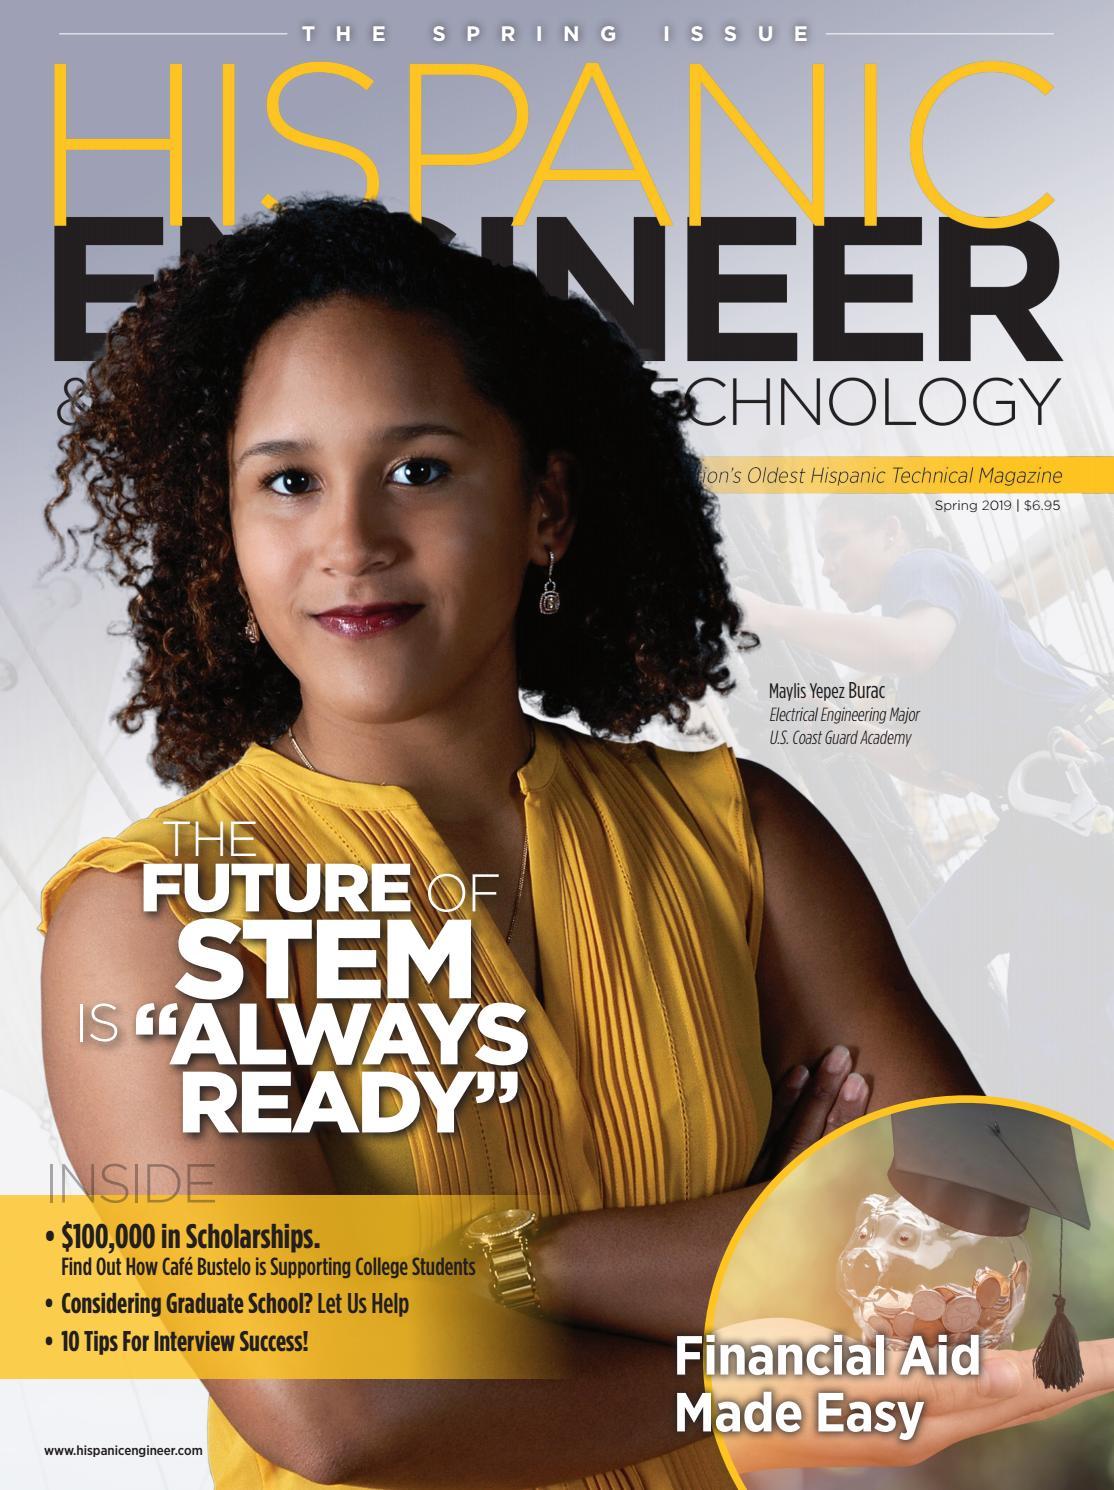 7791ce81c76a0 Hispanic Engineer Volume 34 Issue 1 by CCGMAG - issuu